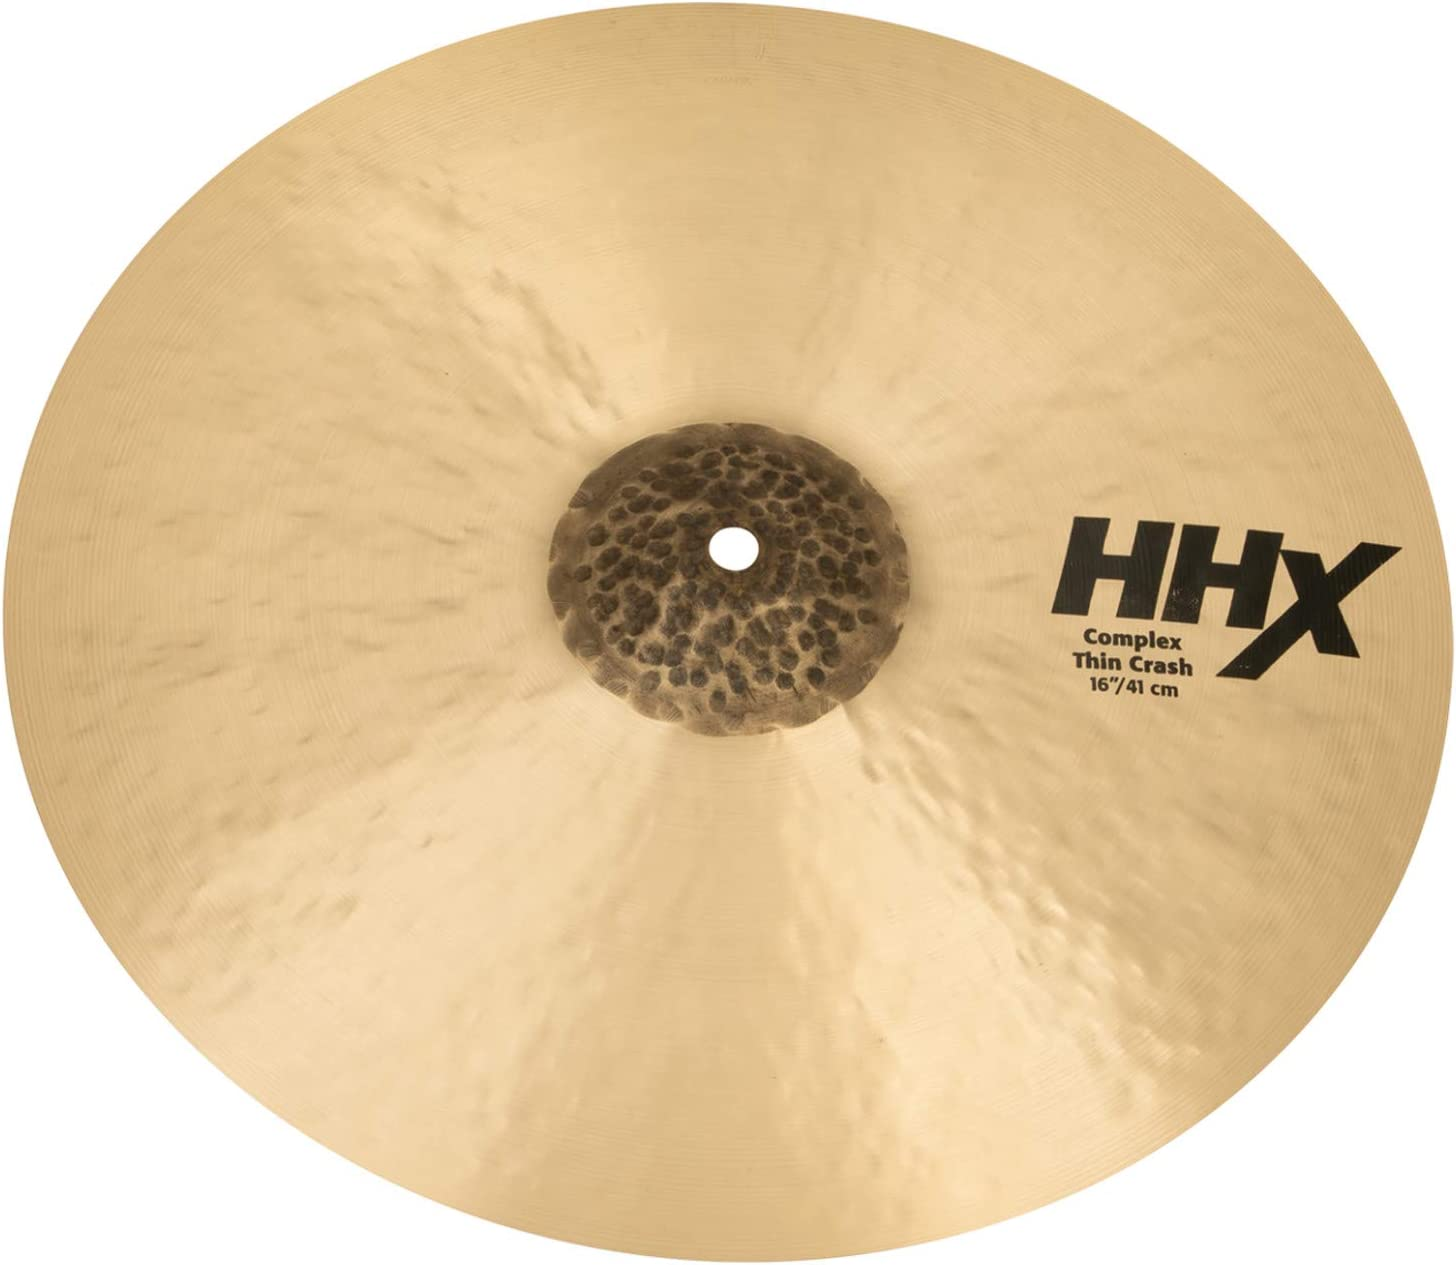 Bag Boom Arm Sabian 15005XCNP HHX Complex Promotional Set Cymbal Pack w//Cloth